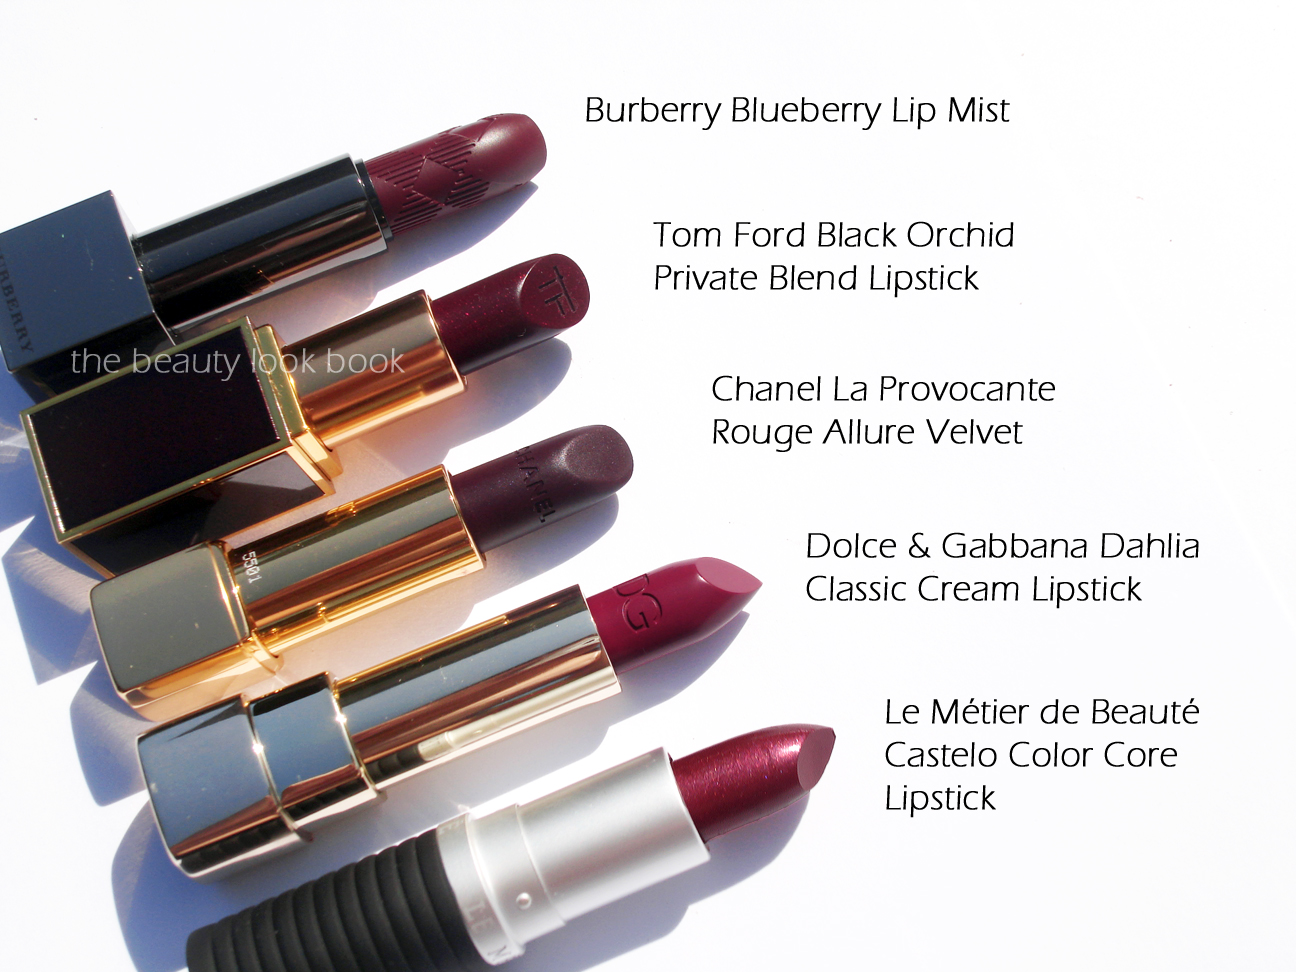 Dark Vampy Lips - Fall/Winter 2012 | The Beauty Look Book